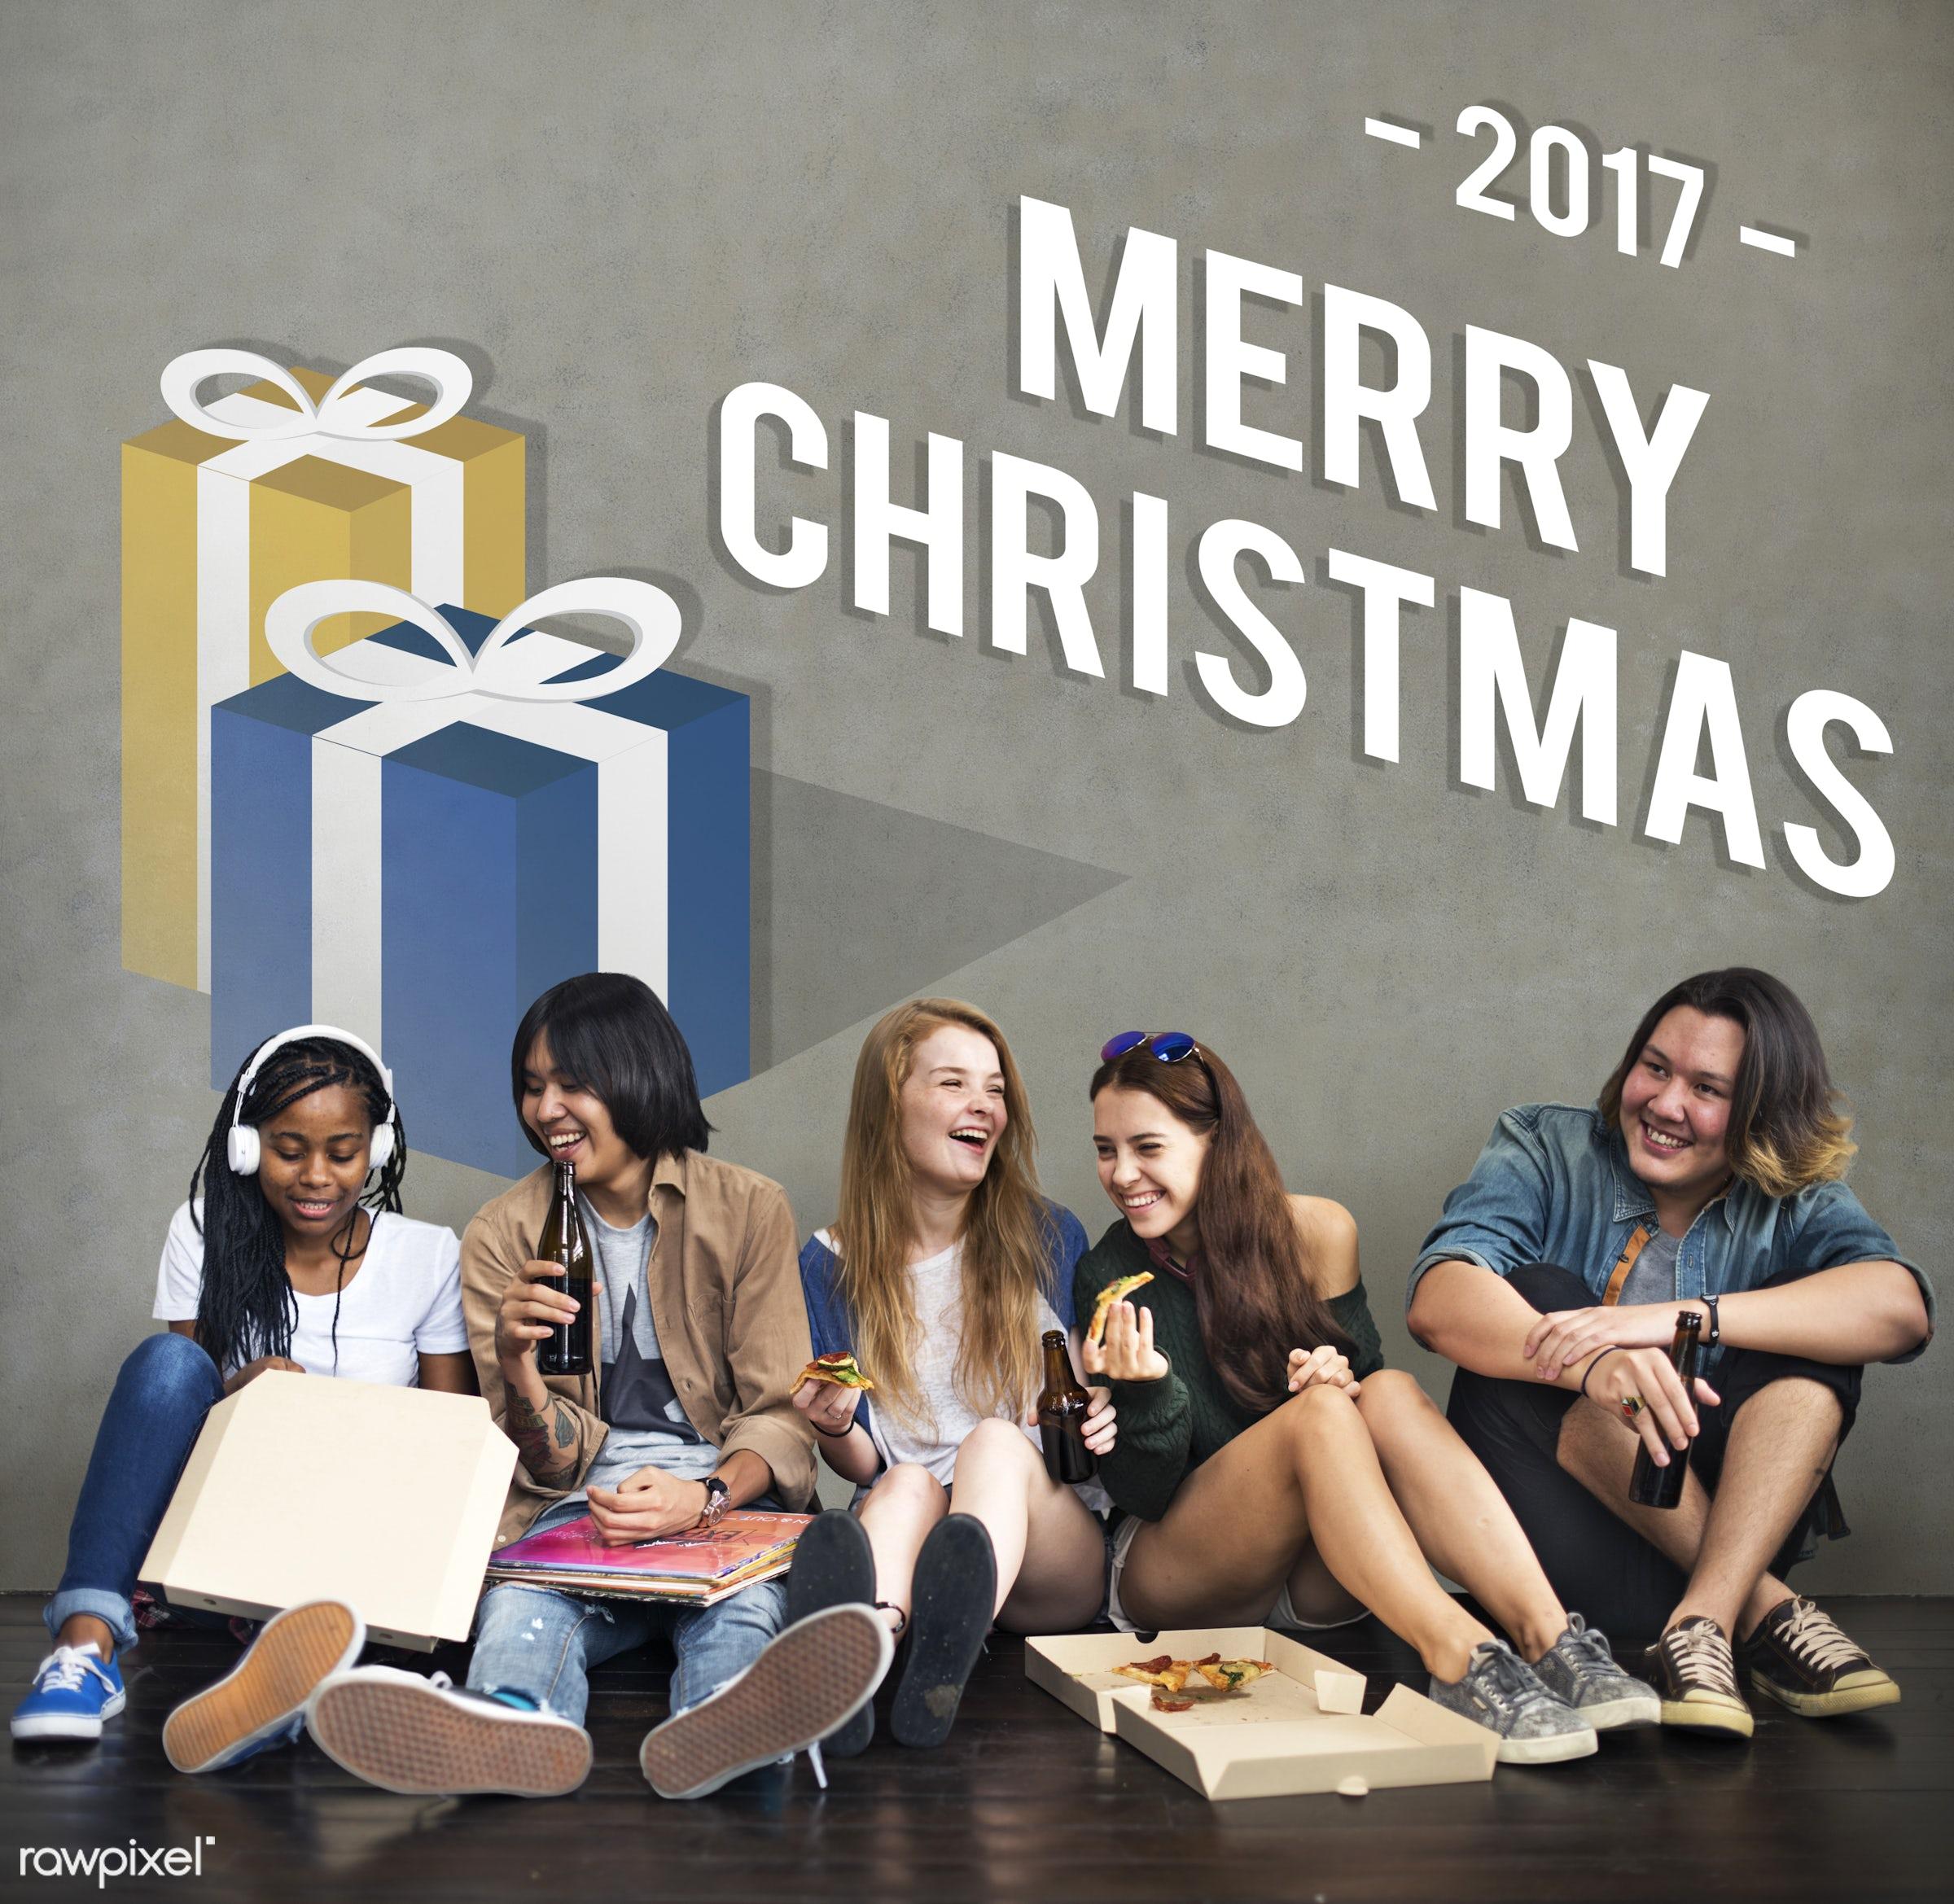 african descent, asian, best wishes, caucasian, celebration, christmas, confetti, decoration, diversity, enjoyment, friends...